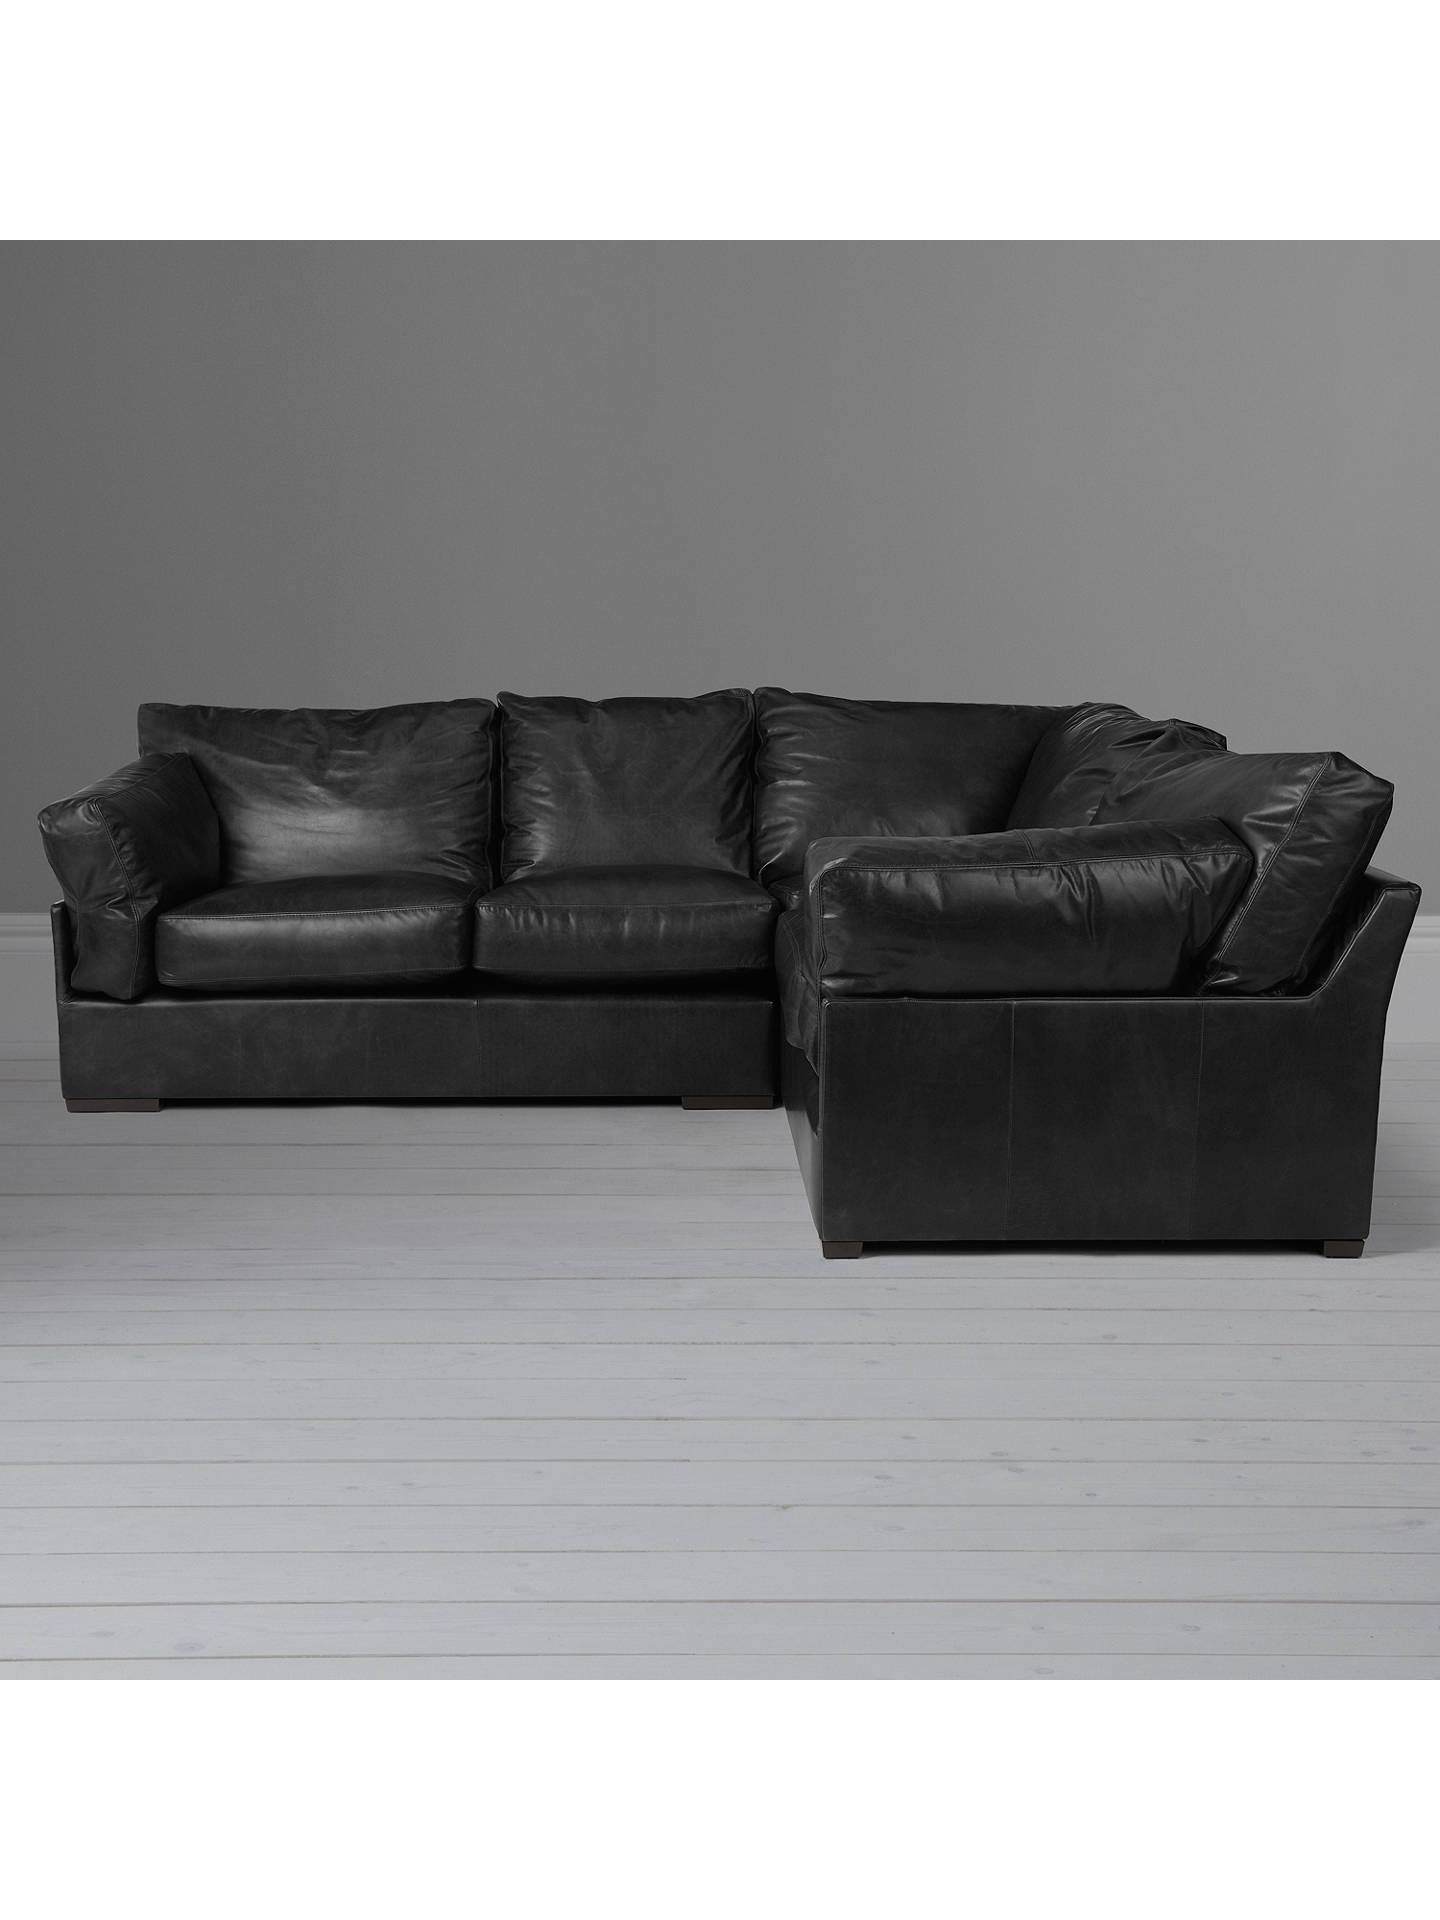 outlet store 17b76 10ed9 John Lewis & Partners Java RHF Leather Corner Sofa, Dark Leg, Contempo Black